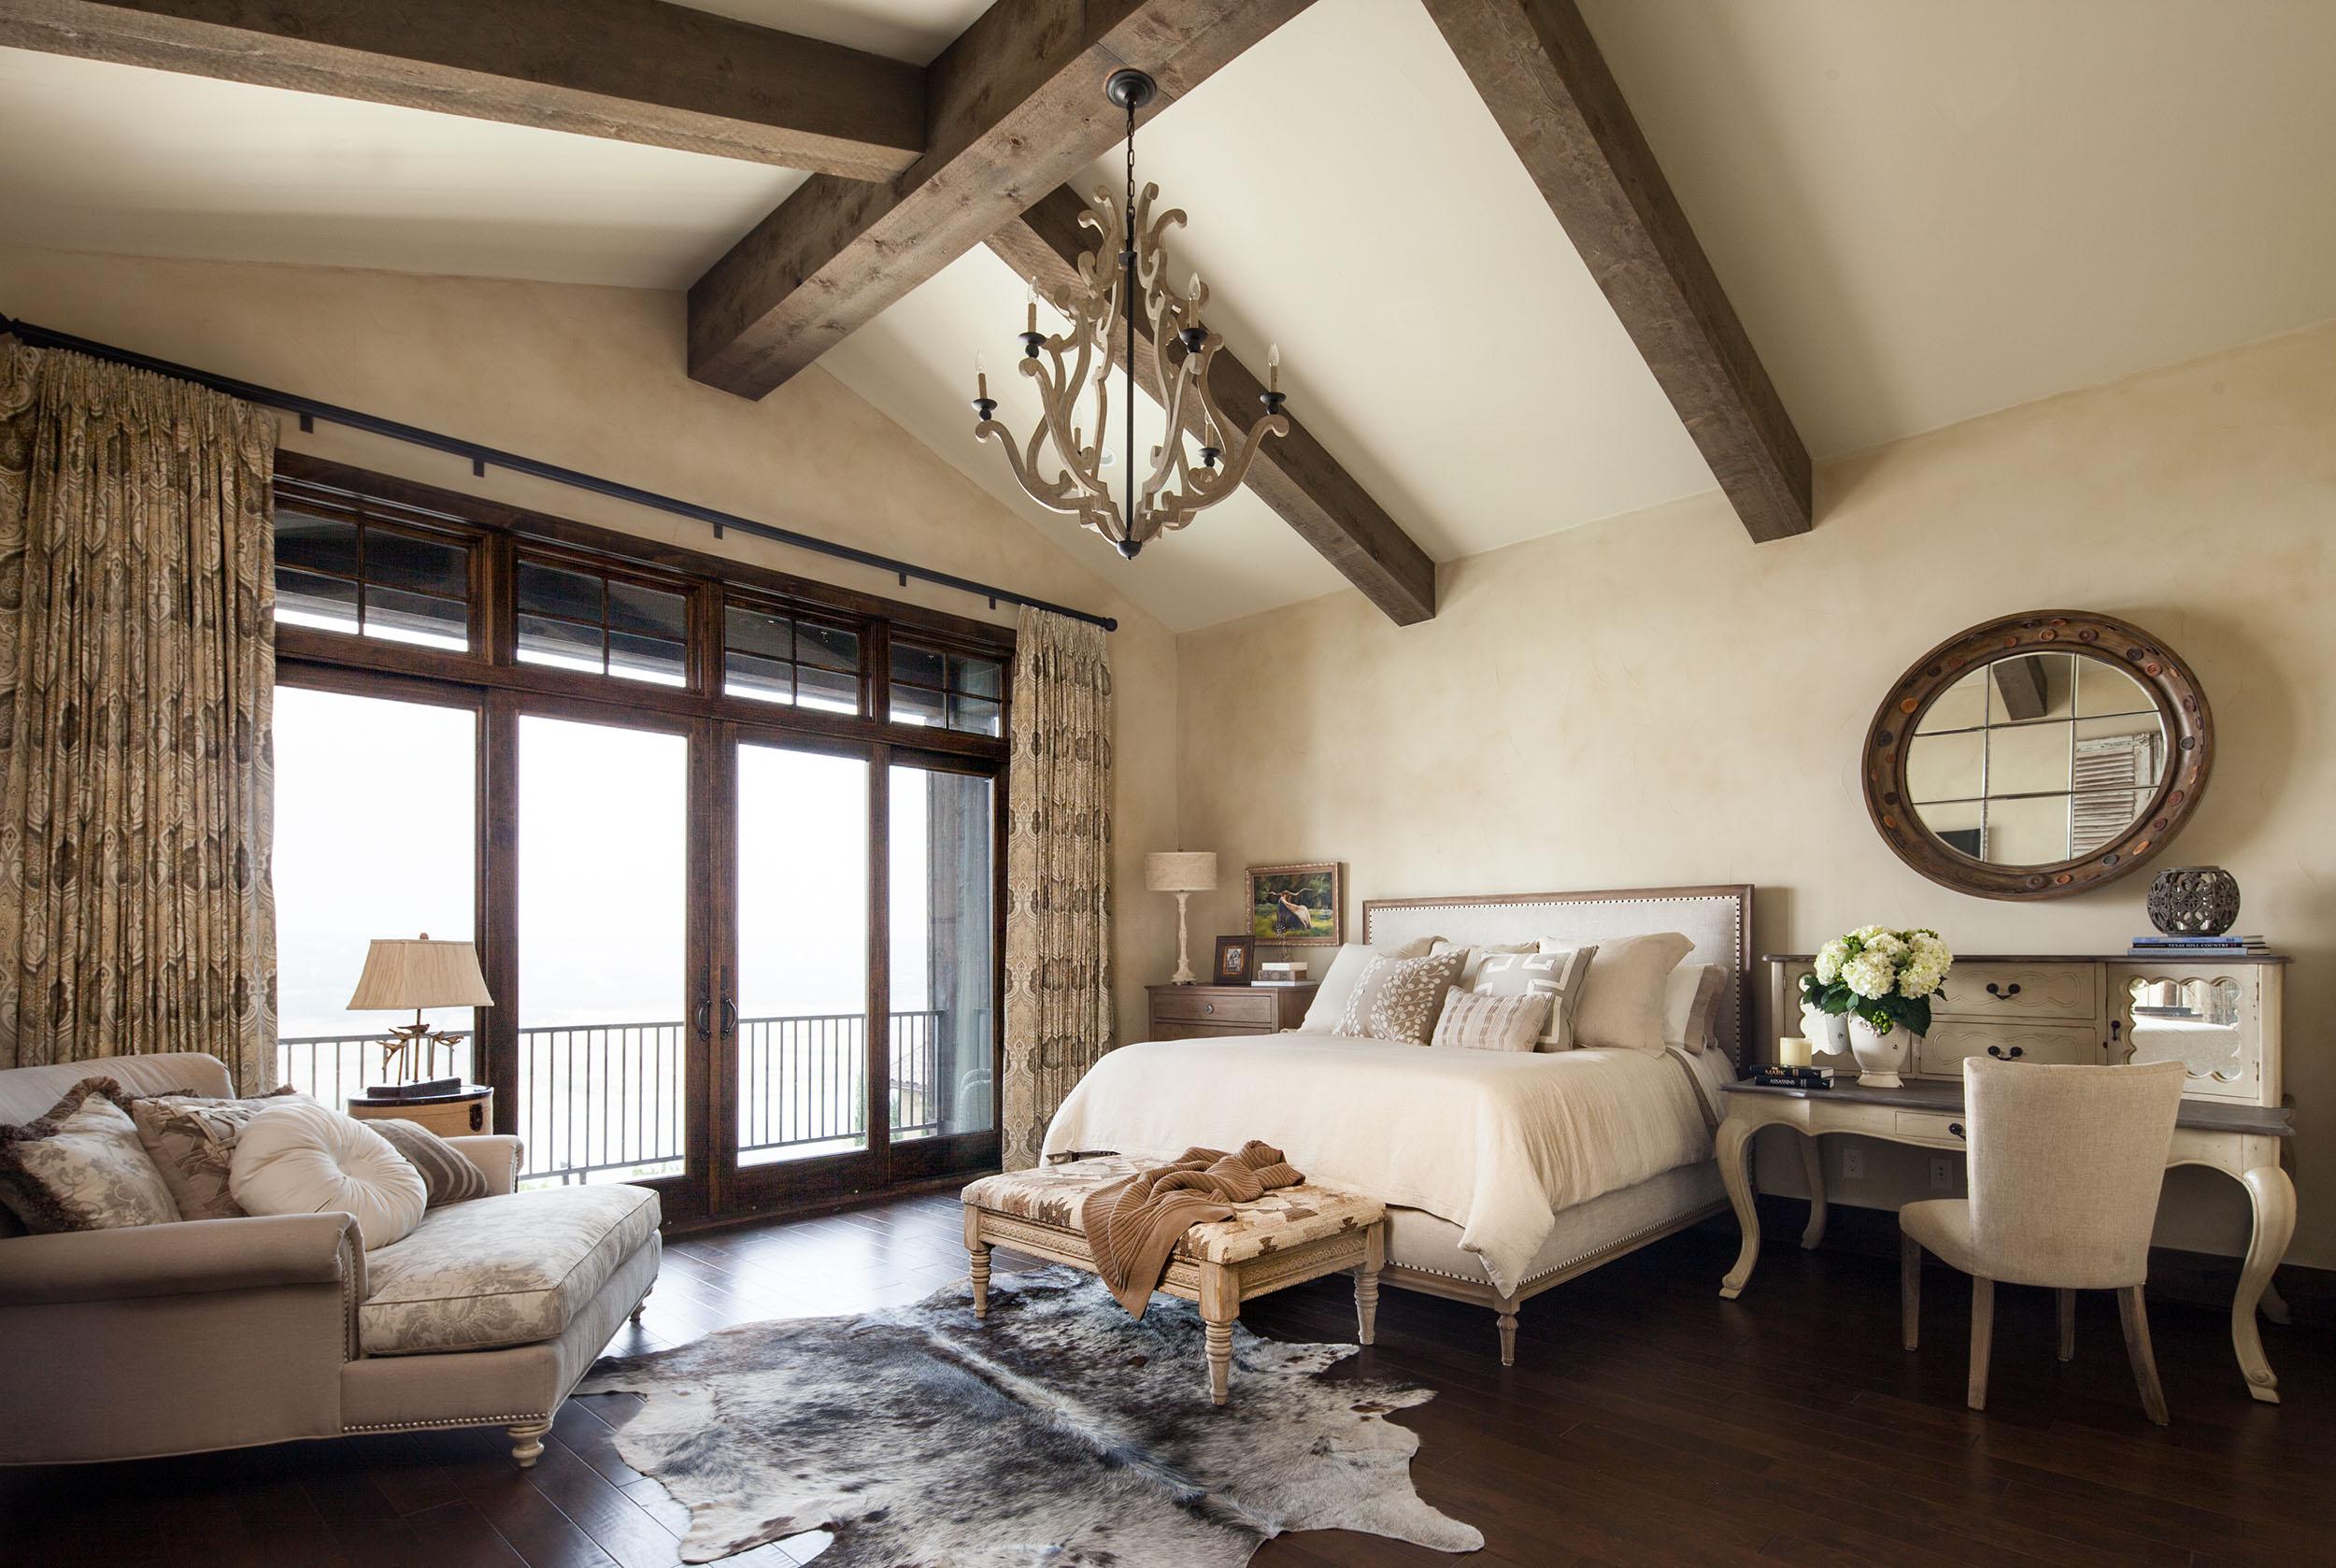 austin-house-master-bedroom-interior-design.jpg